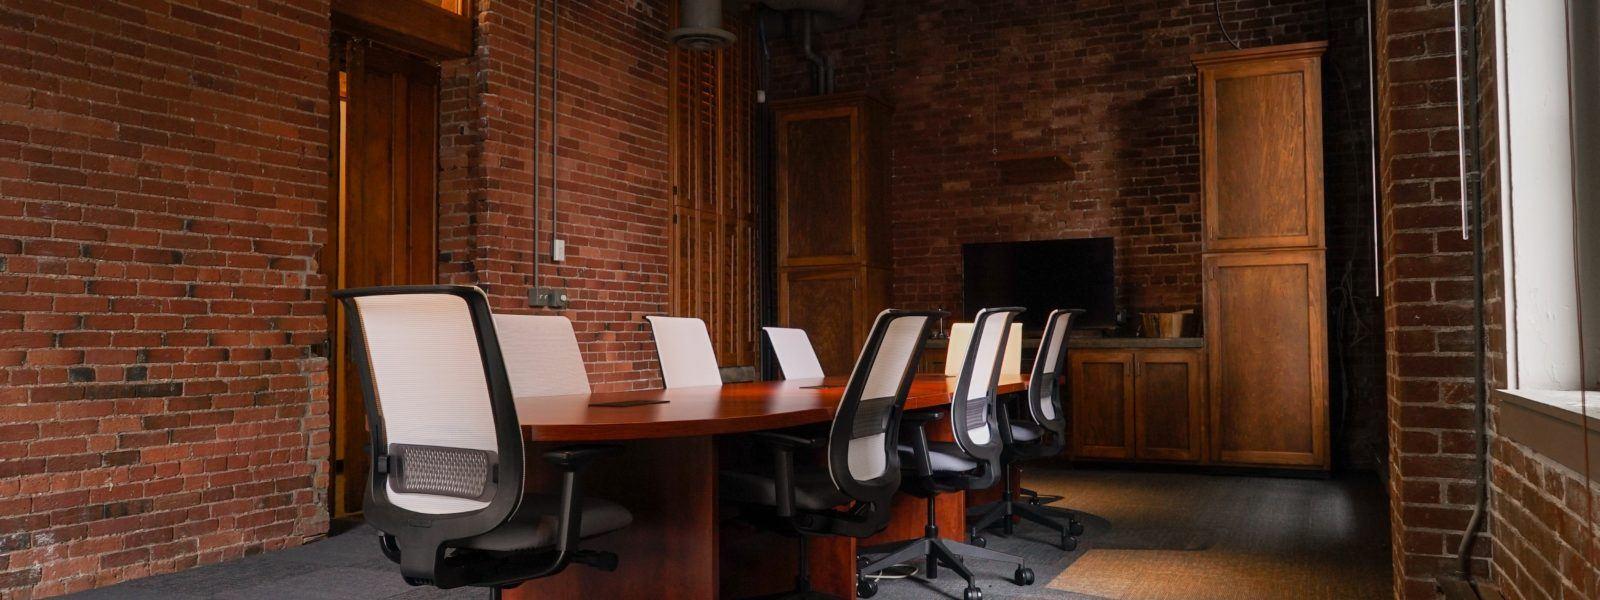 Speak Easy Boardroom